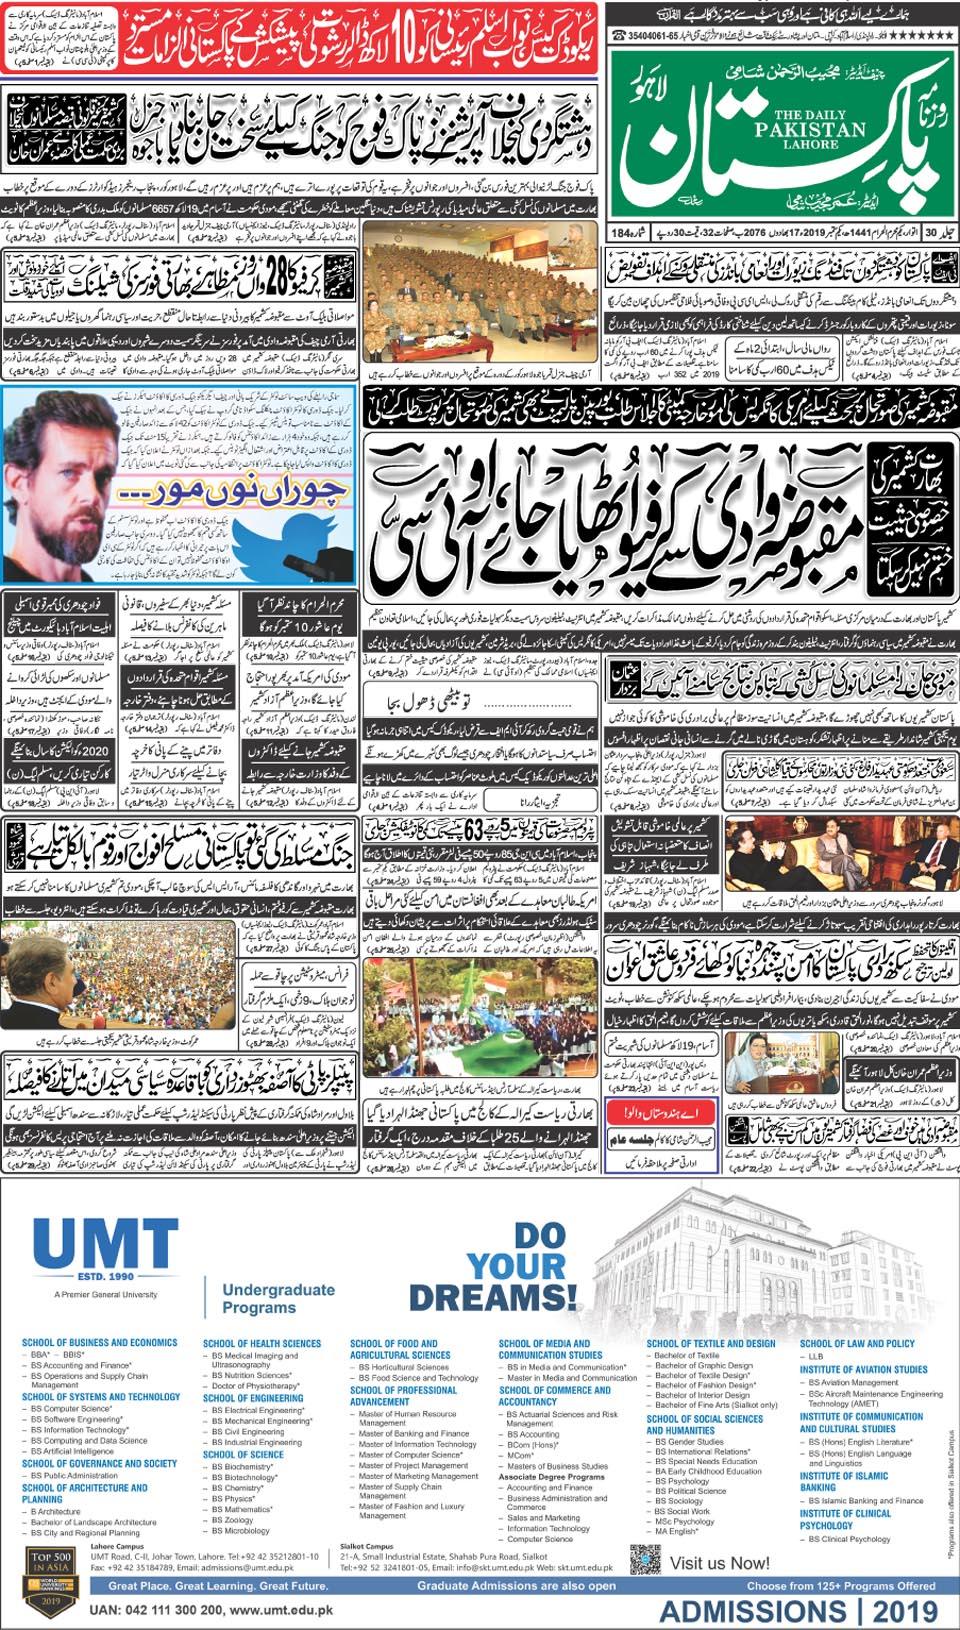 Daily Pakistan Newspaper, Daily Pakistan English ePaper